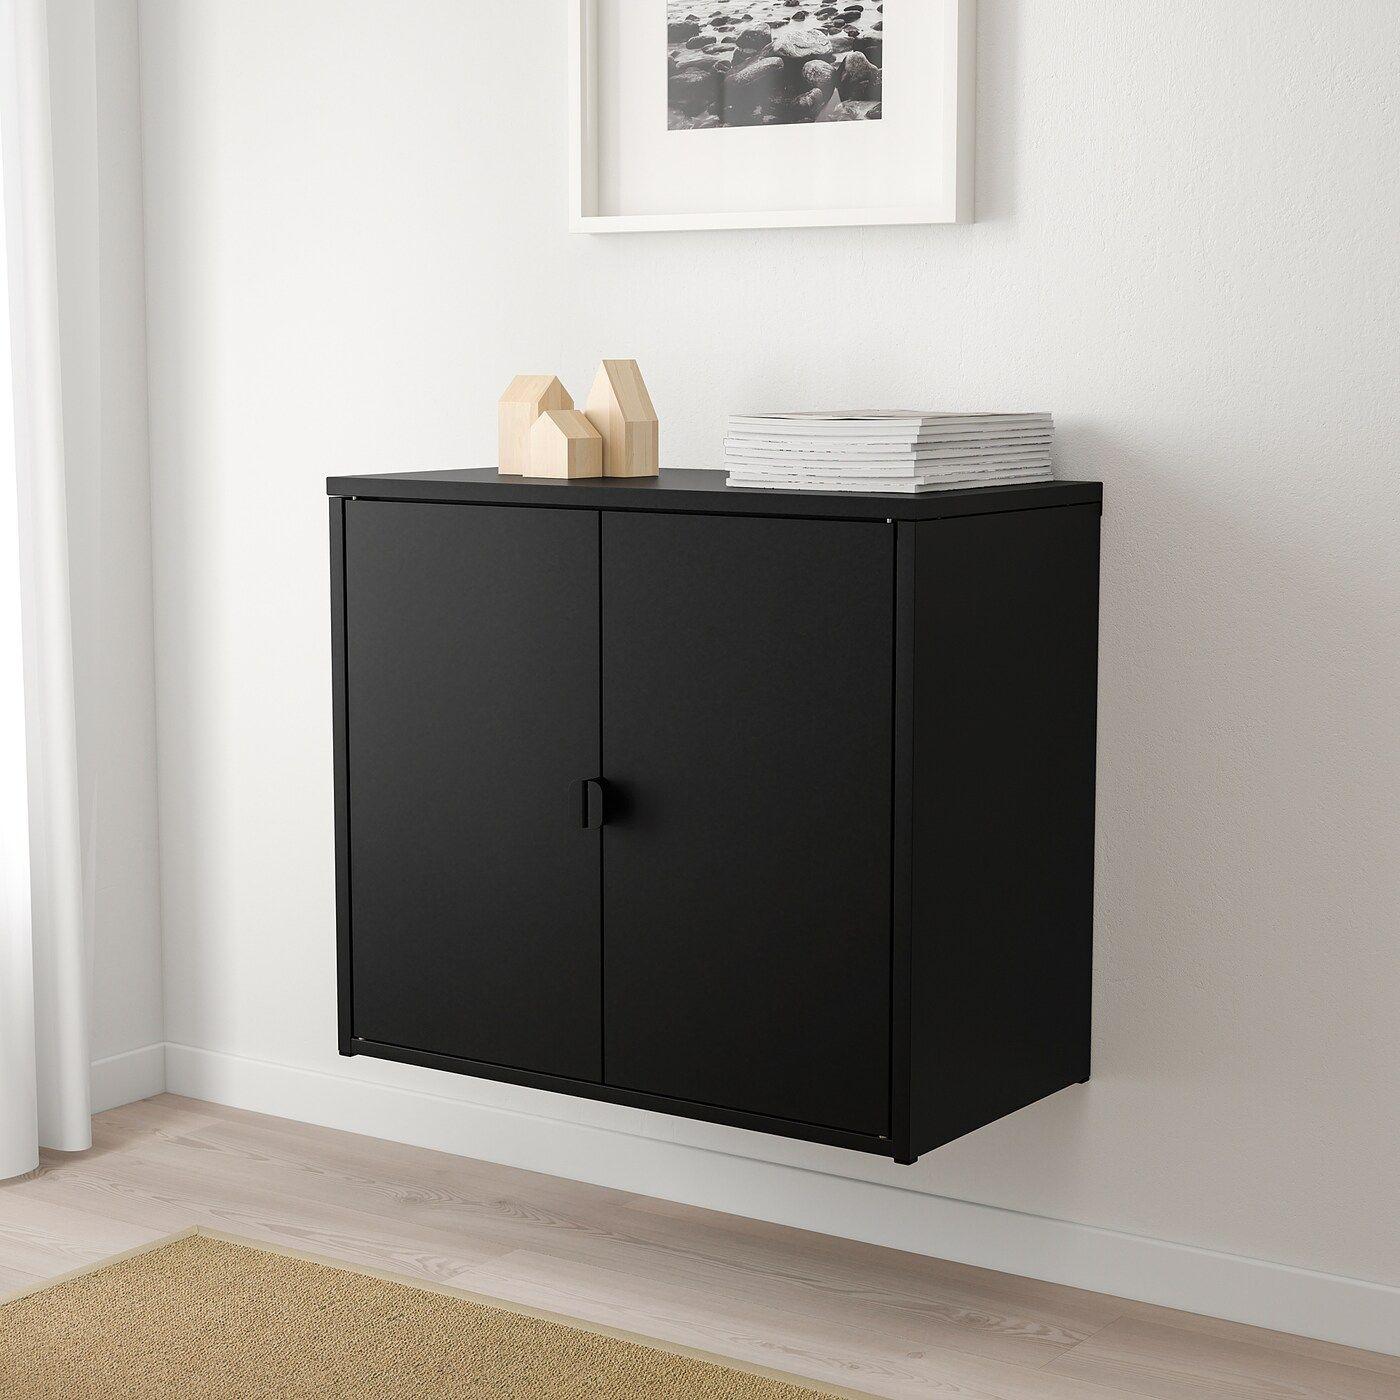 IKEA – BROR Armoire 2 portes Noir